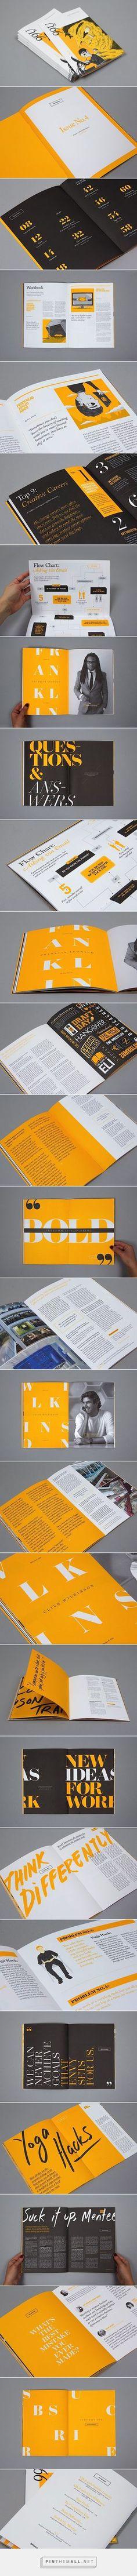 Editorial Design Inspiration: 99U Quarterly Mag No.4 | Abduzeedo Design Inspiration  - design inspiration stuff ! -